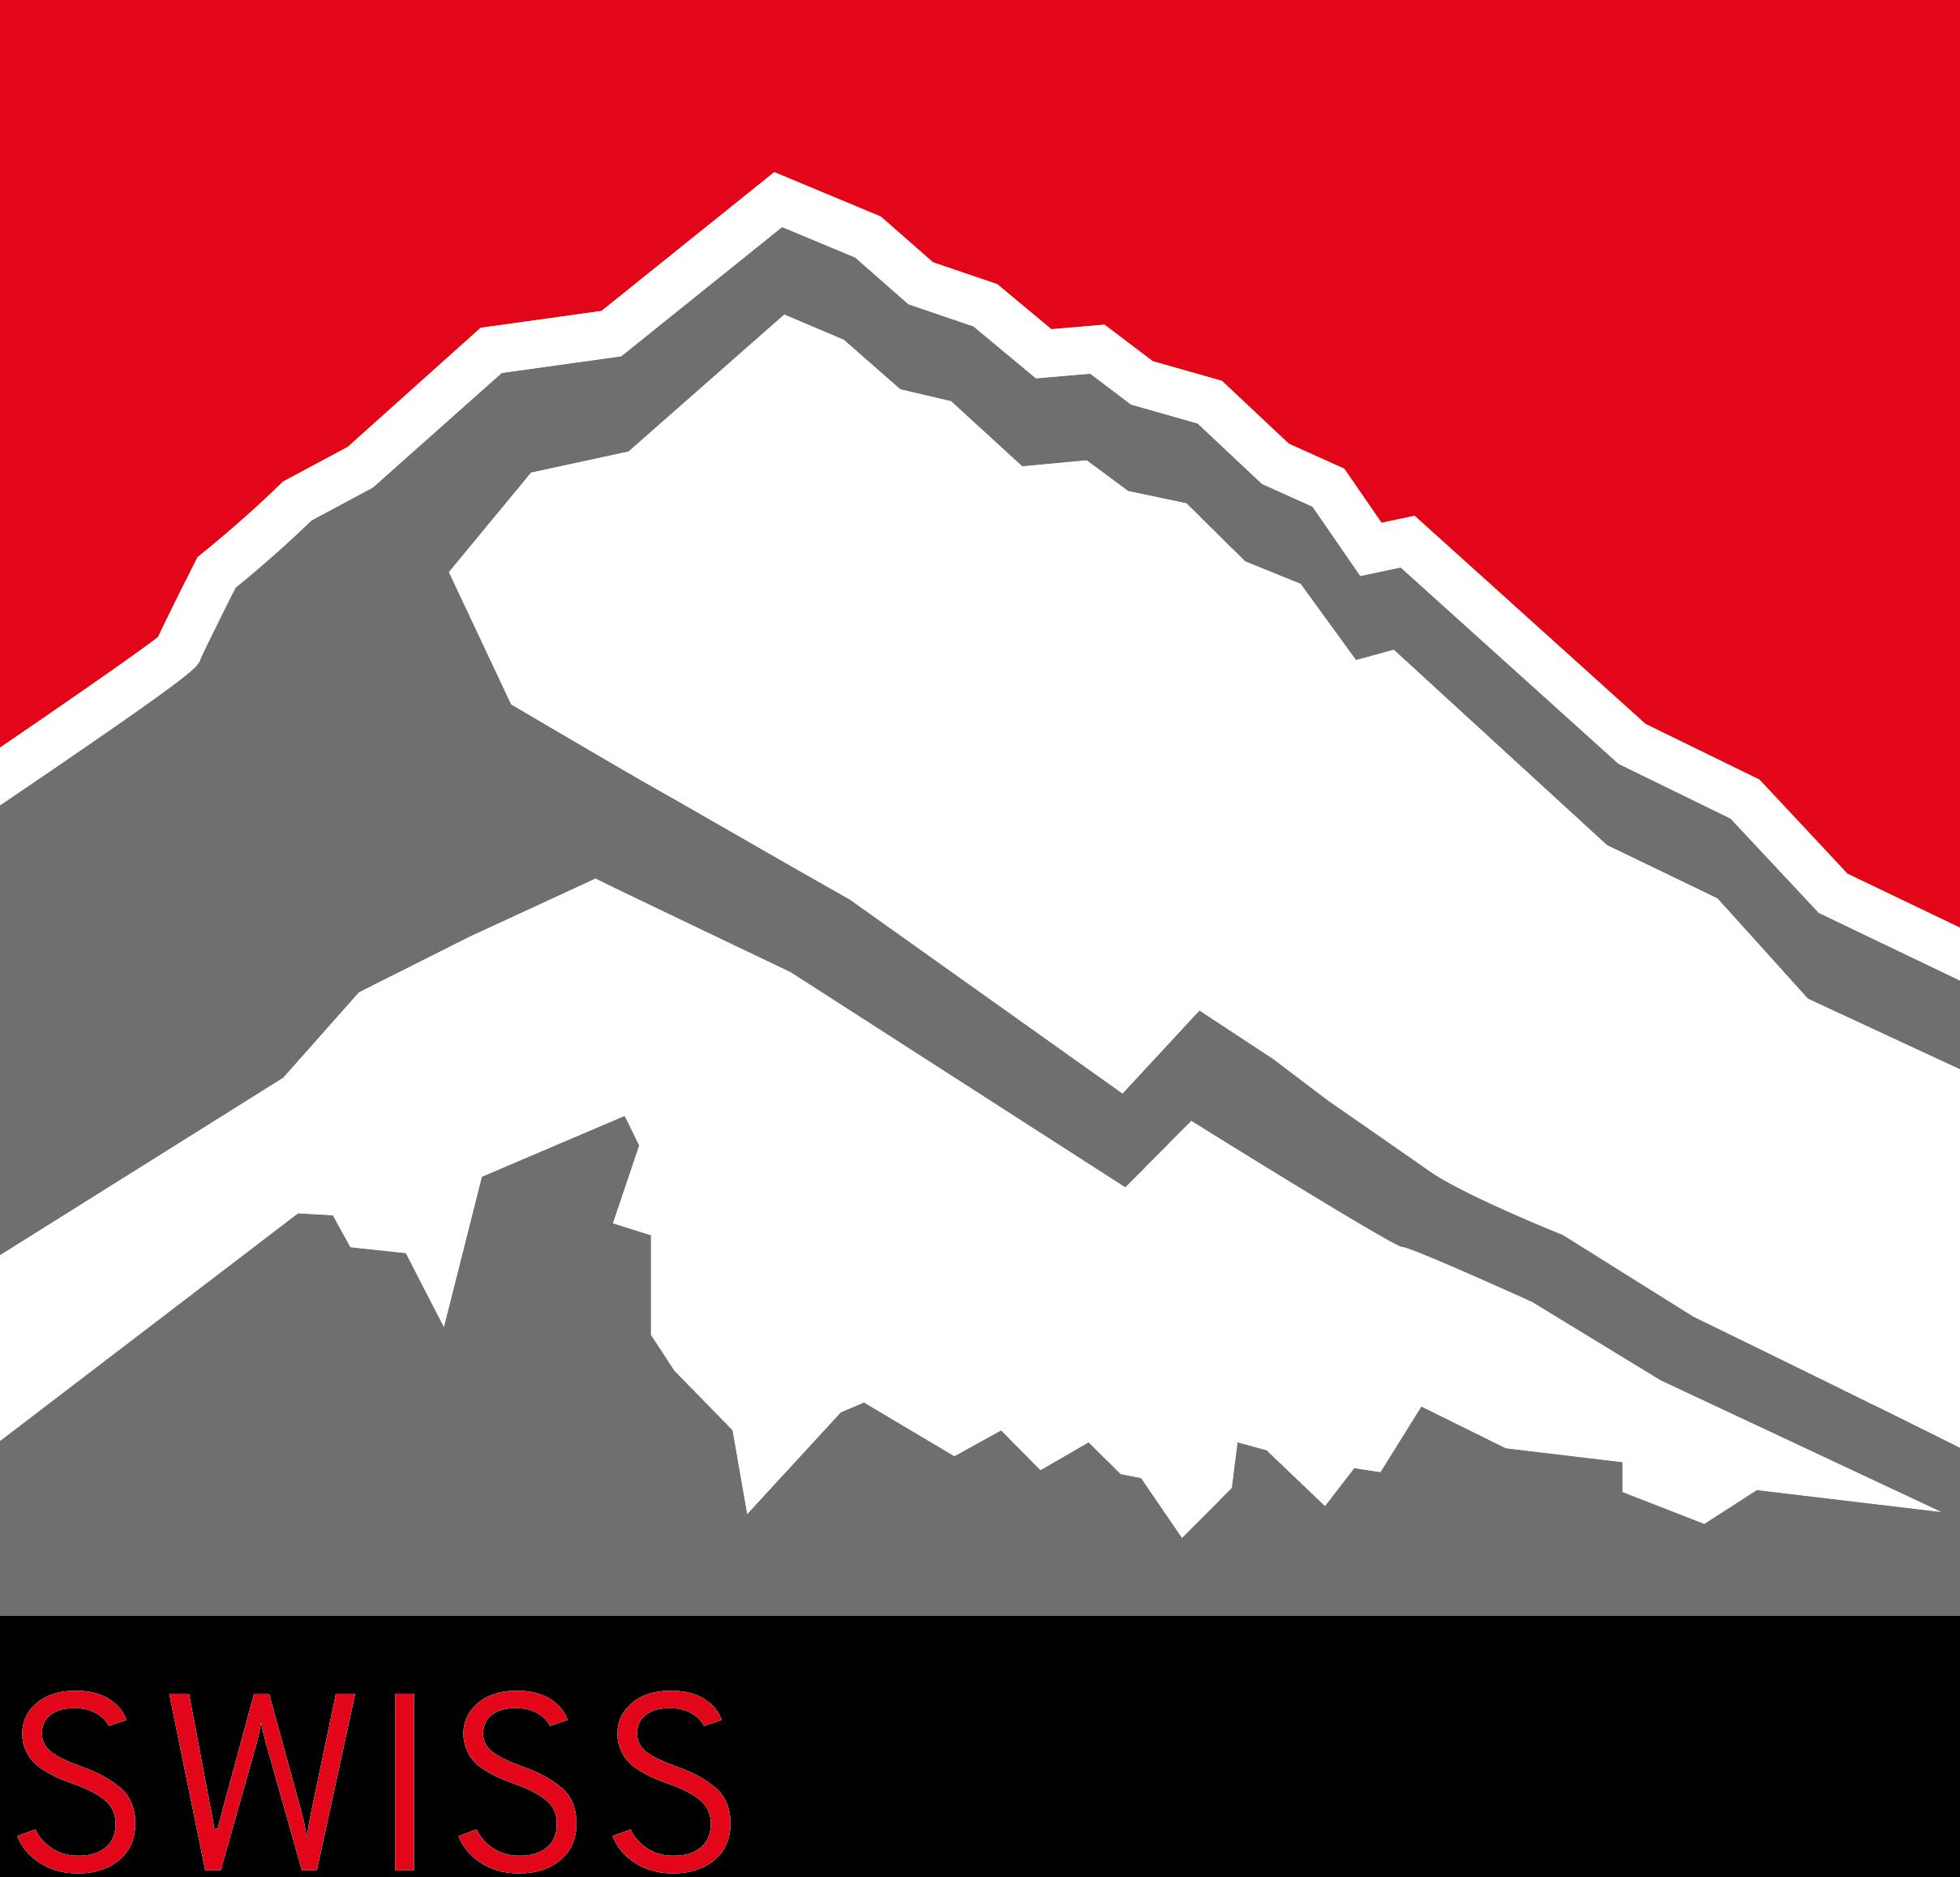 Swisspoles.ch